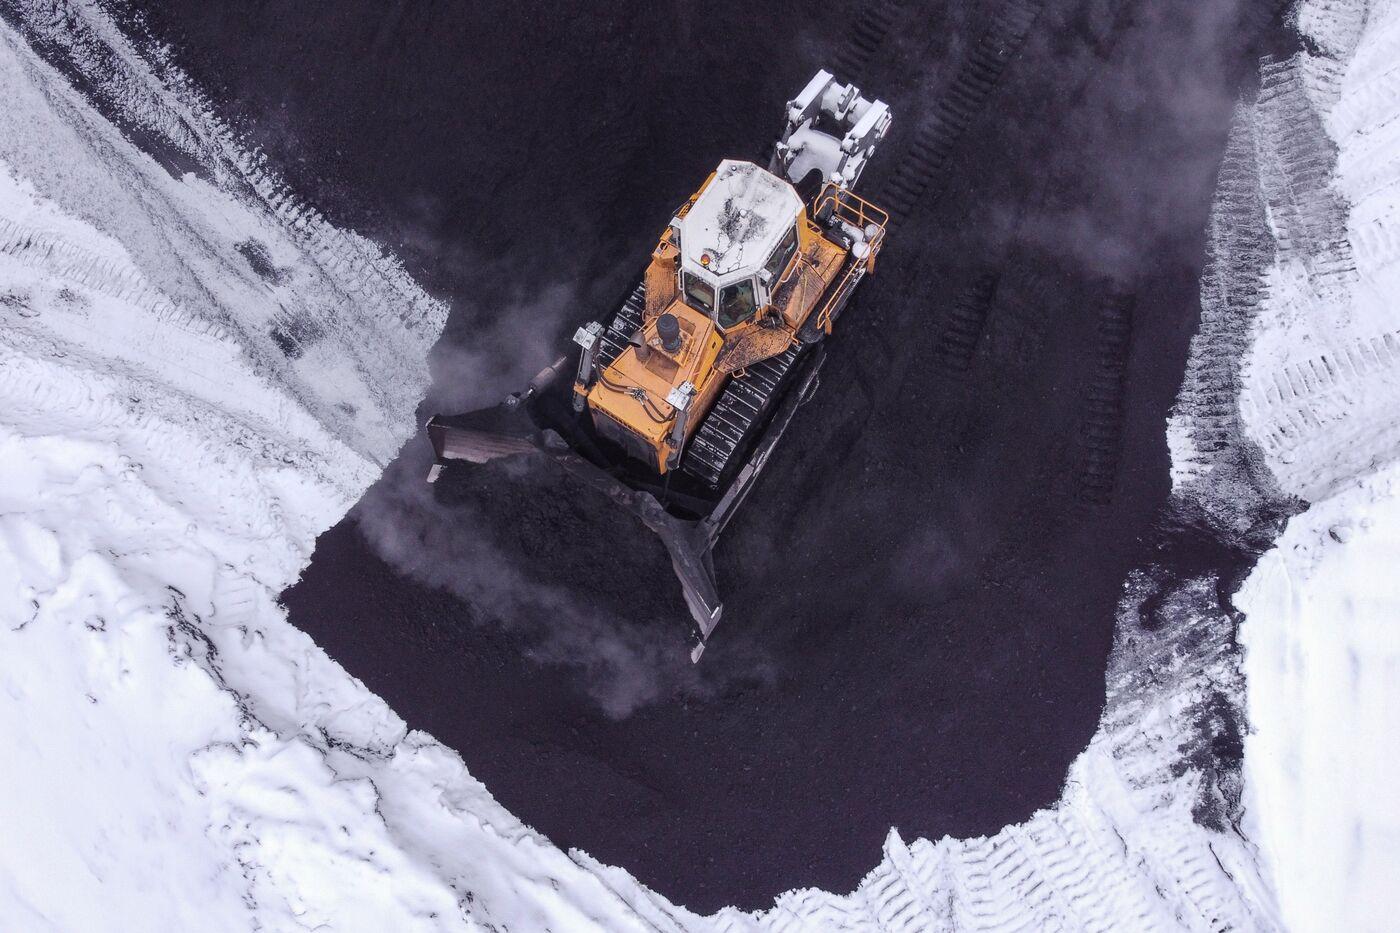 A bulldozer moves piles of coal at the Osinnikovskaya coal mine in Osinniki, Russia.